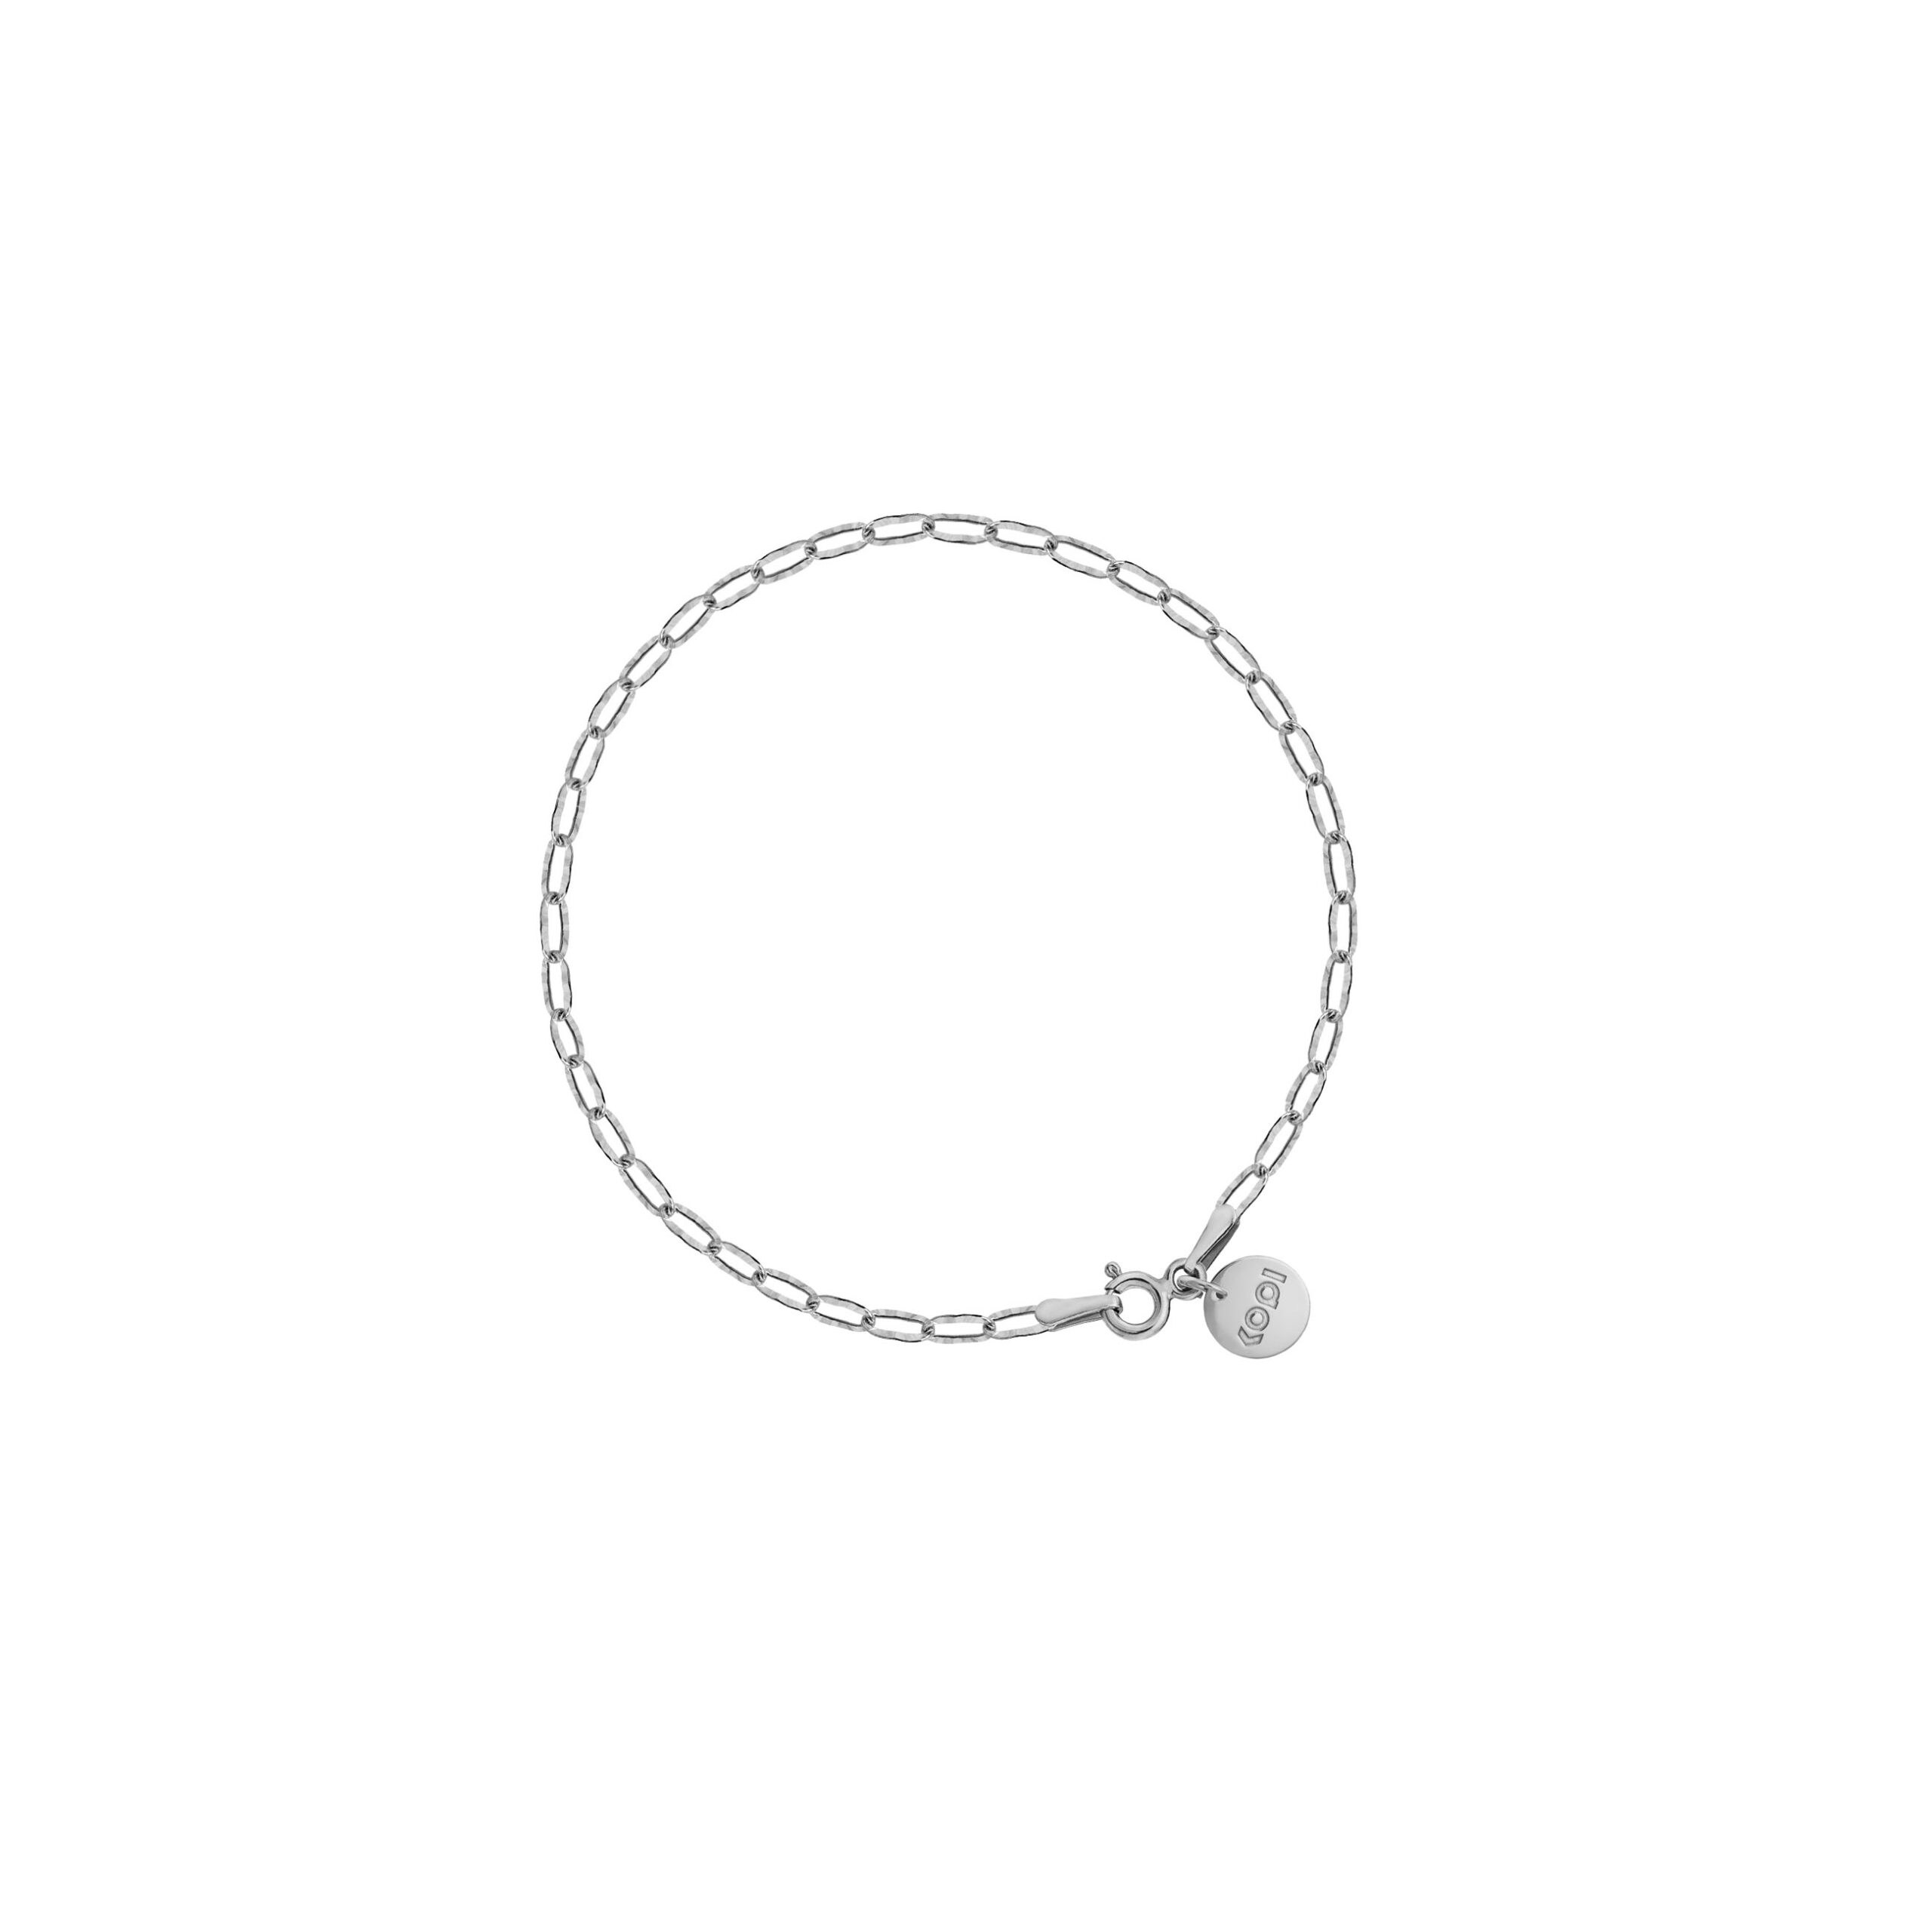 Bracelet Simple KOPI Silver